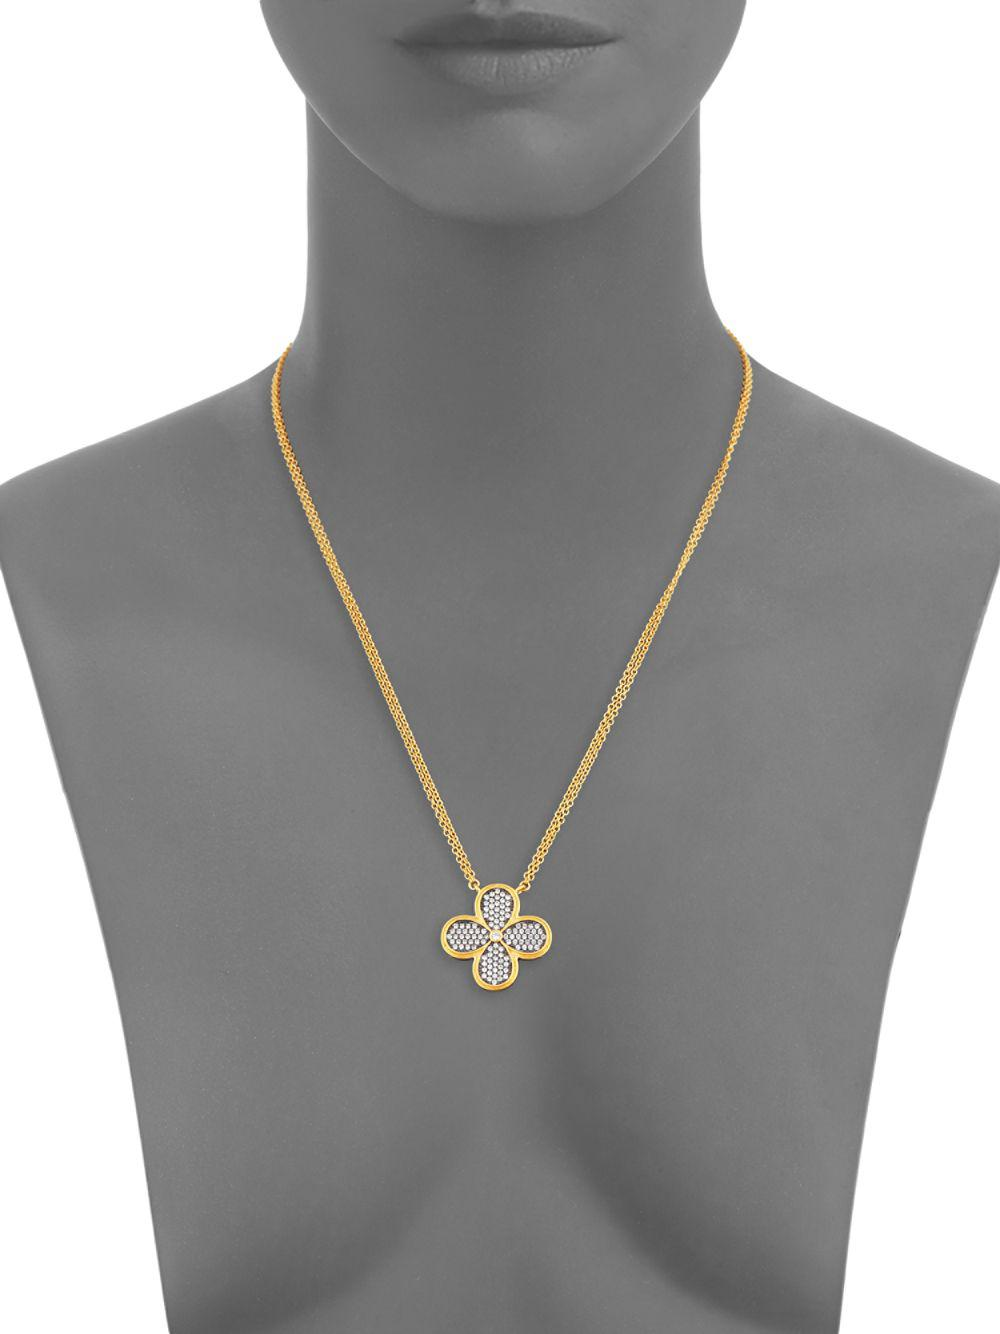 Freida Rothman Floral Pendant Necklace in Gold (Metallic)